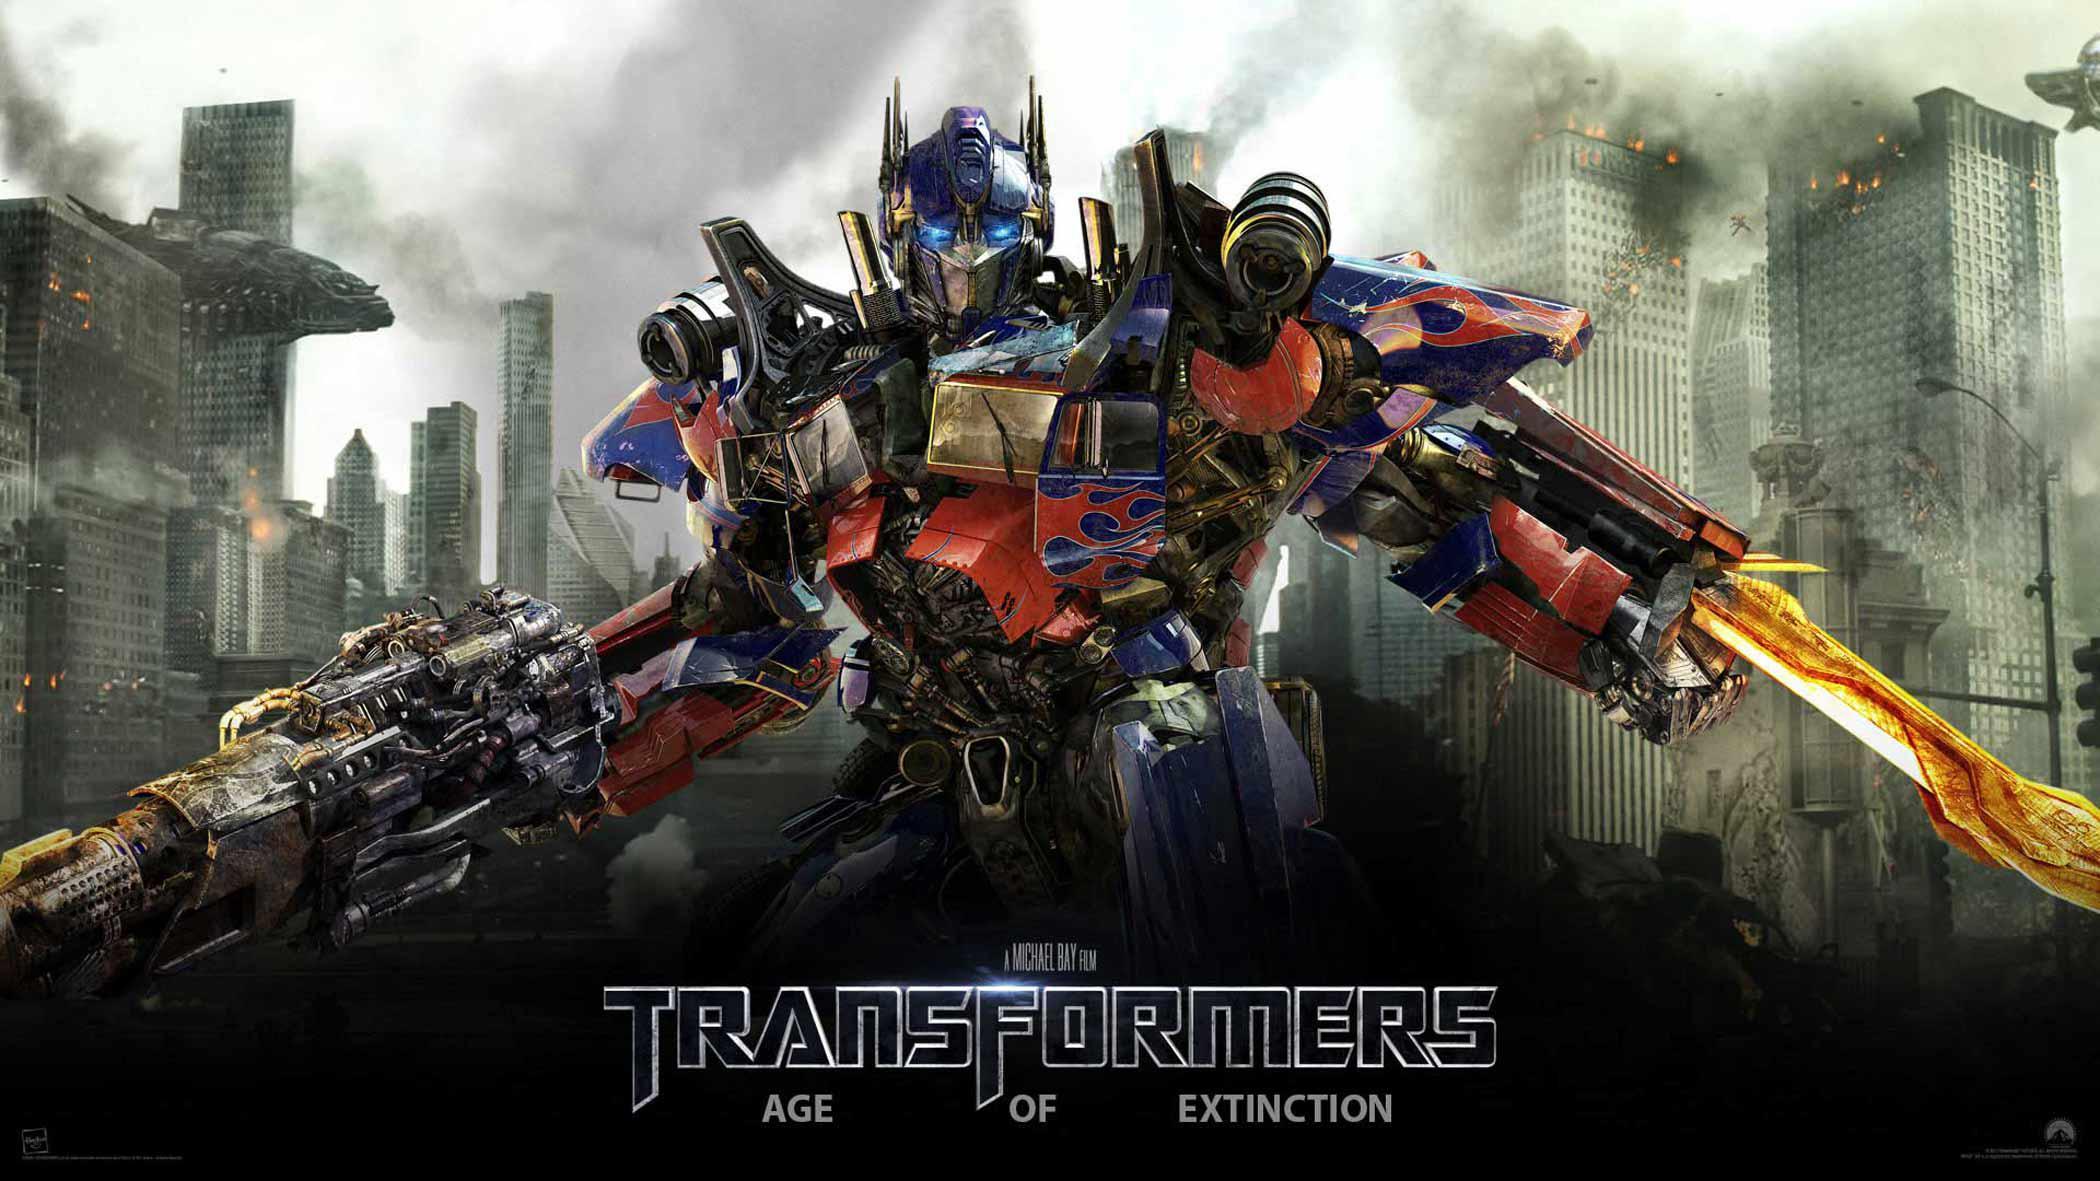 Wallpaper Transformers 4 Age of Extinction Optimus Prime Poster